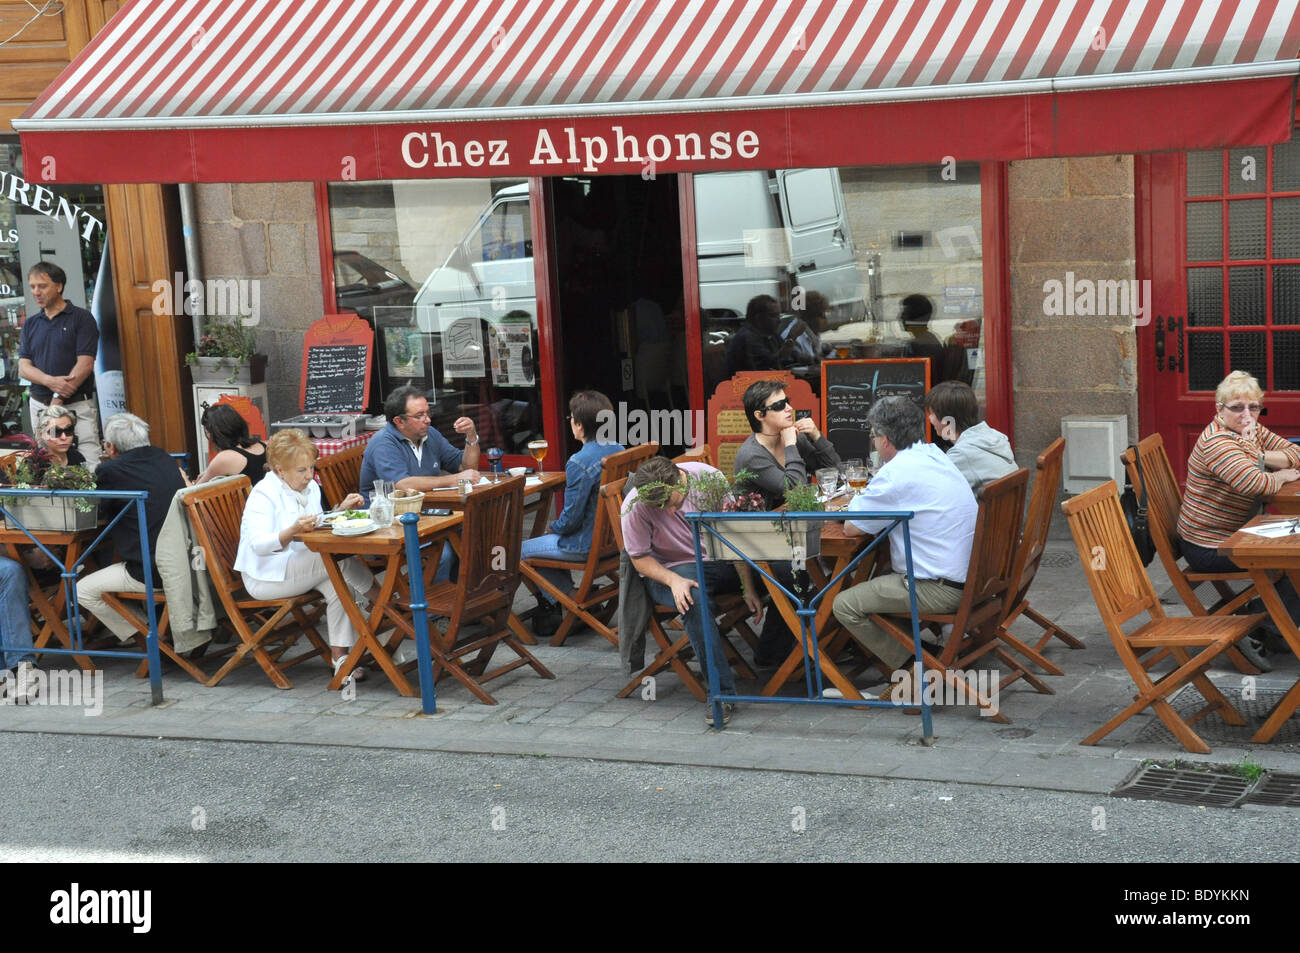 Chez Alphonse Limoges Limousin France - Stock Image